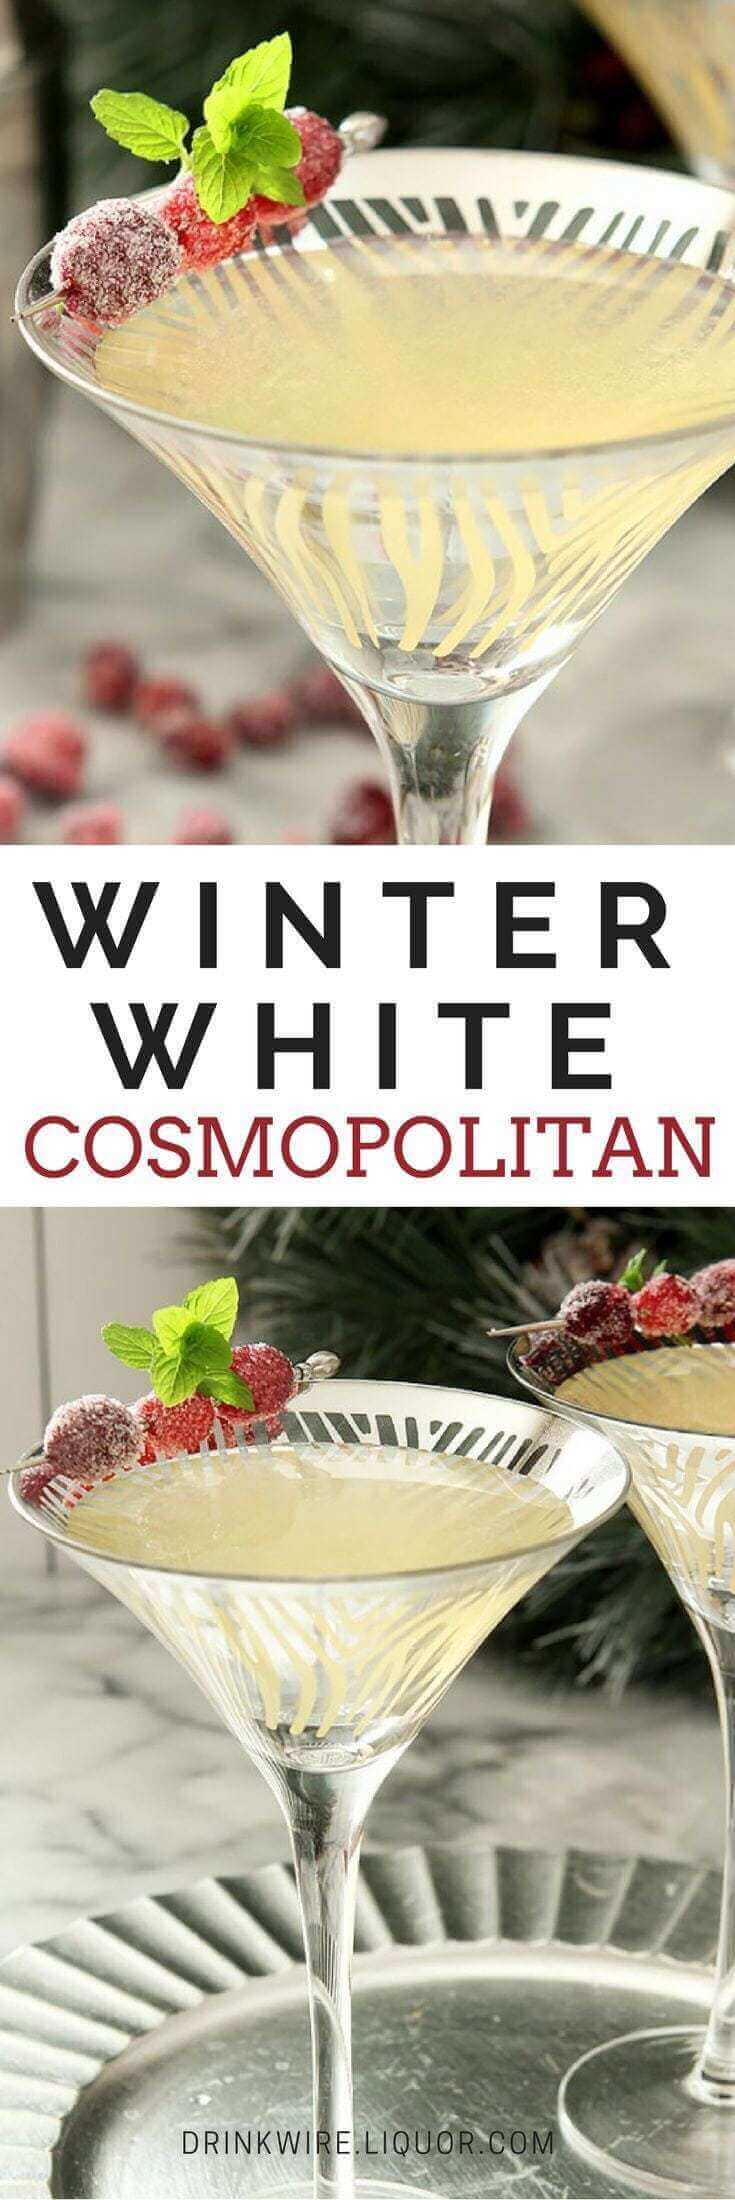 Winter White Cosmopolitan.